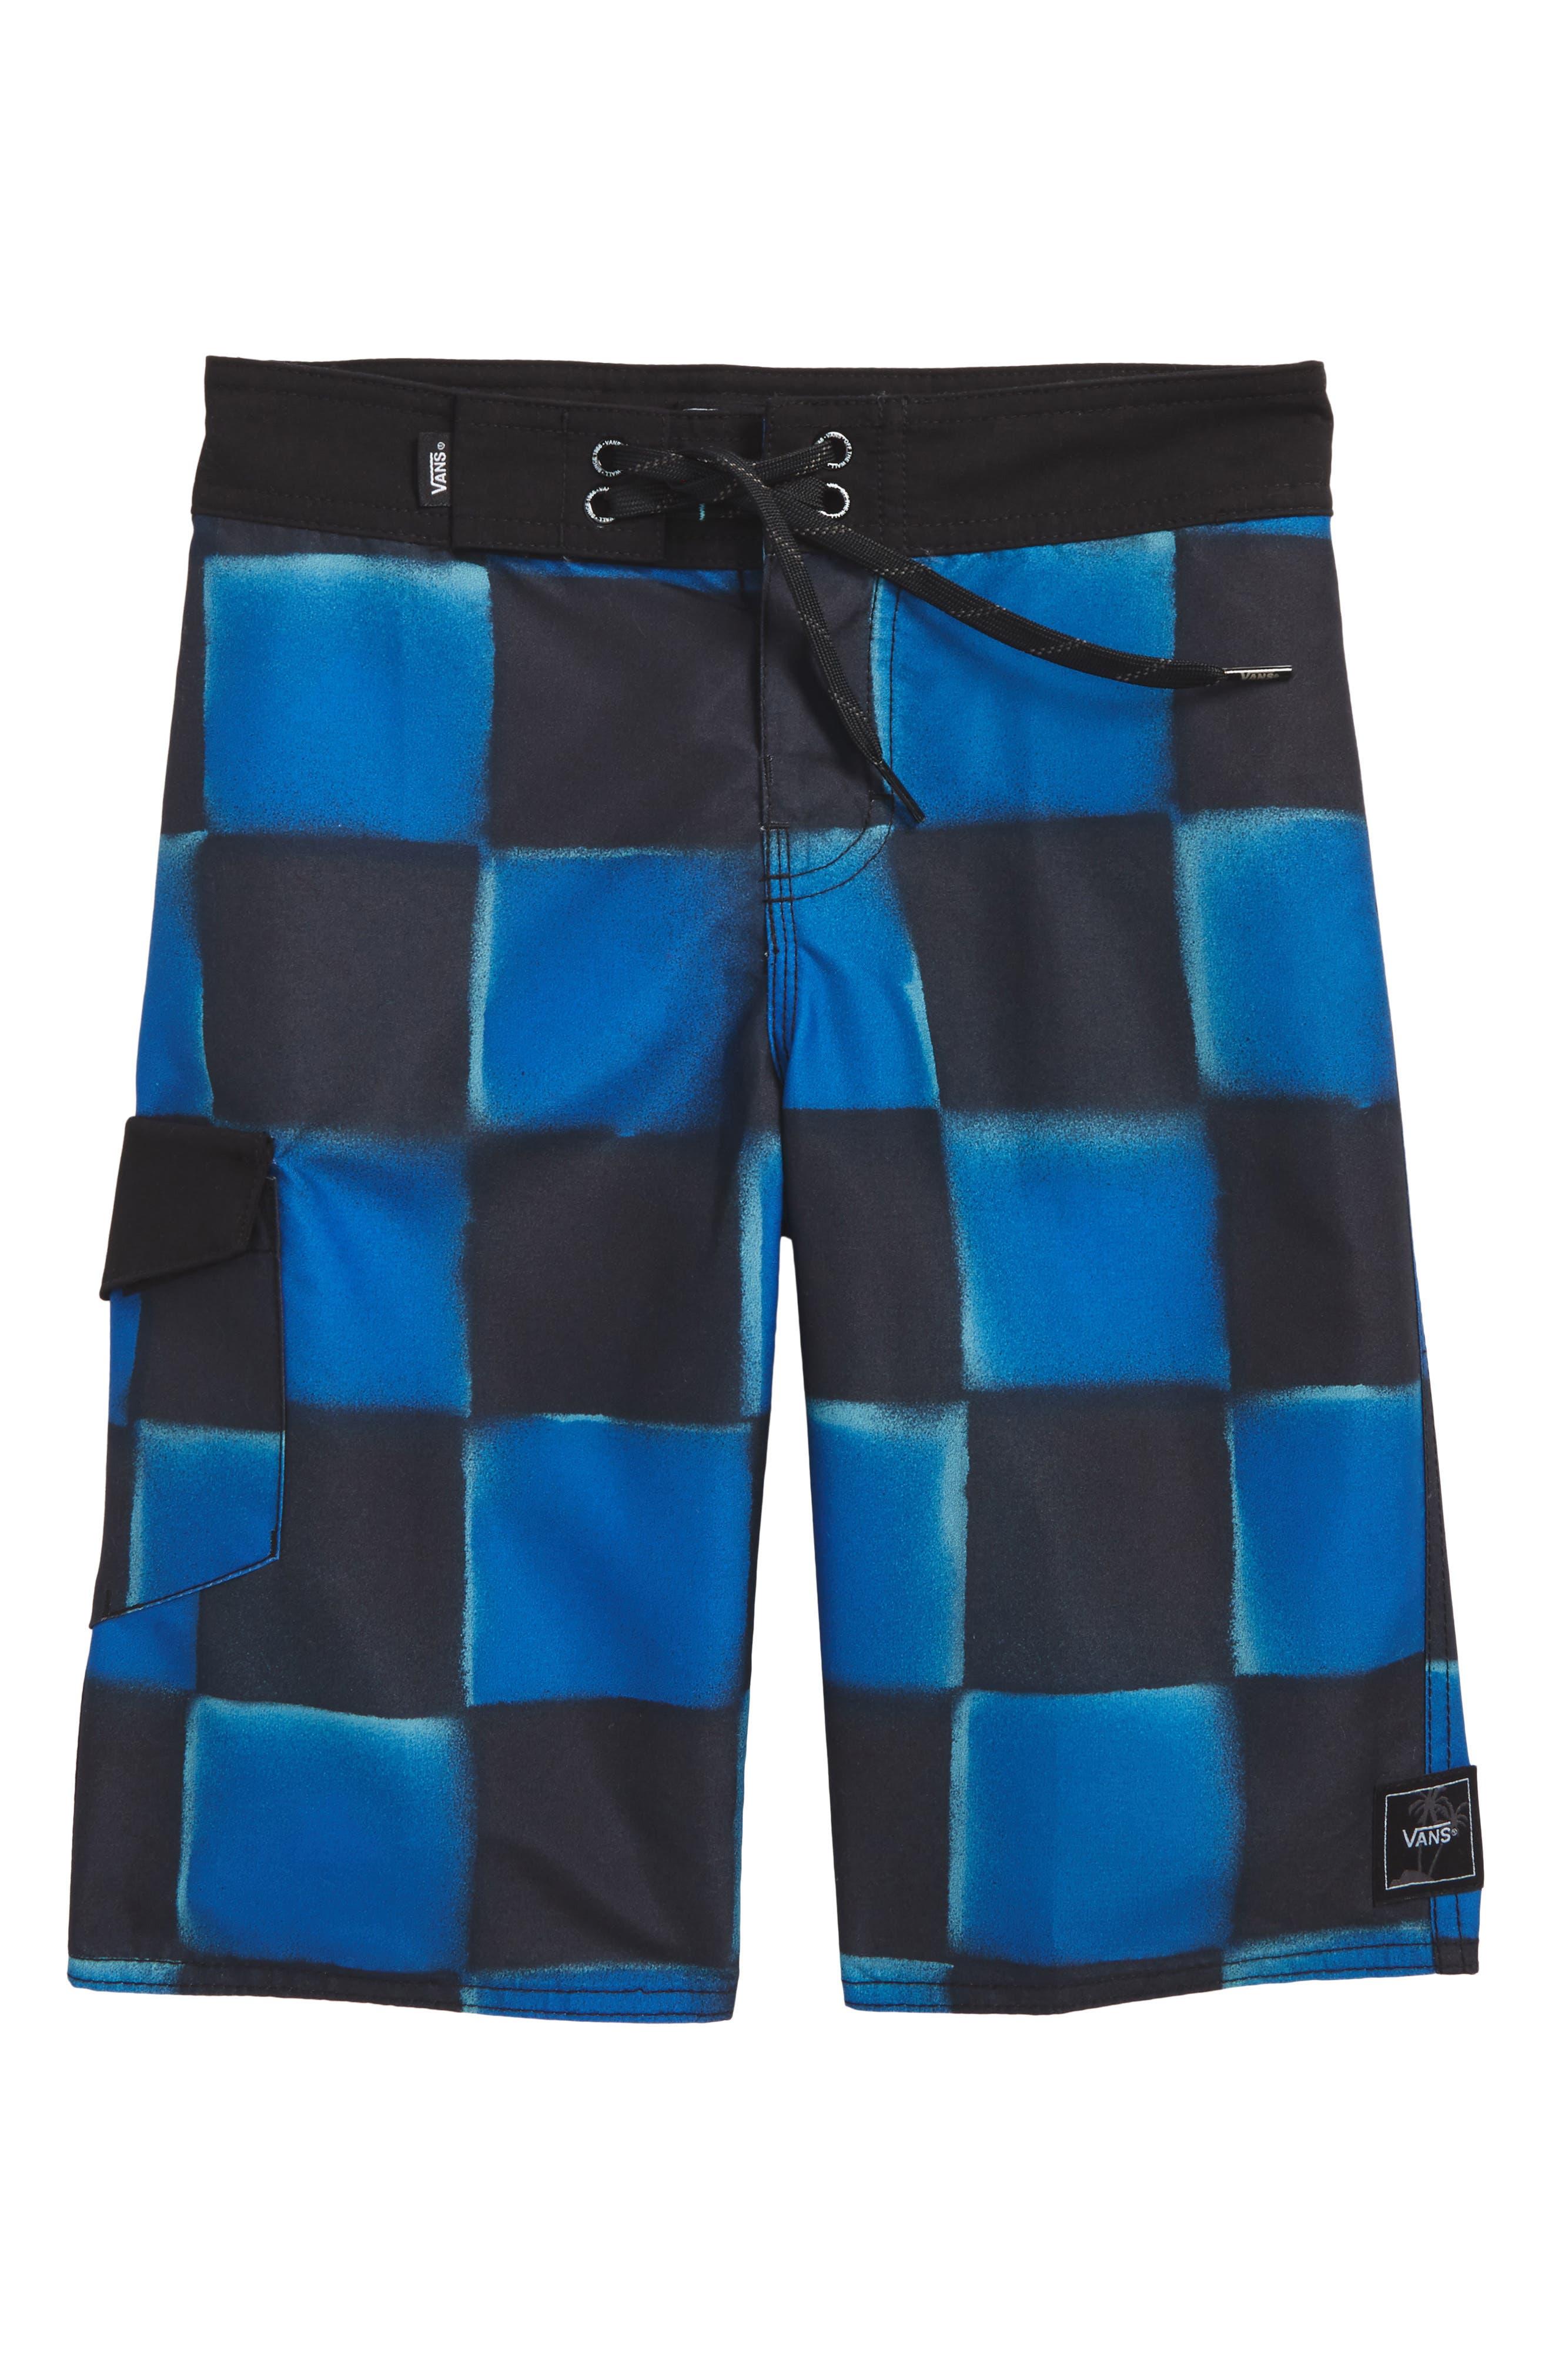 Check Yourself II Board Shorts,                             Main thumbnail 1, color,                             Victoria Blue